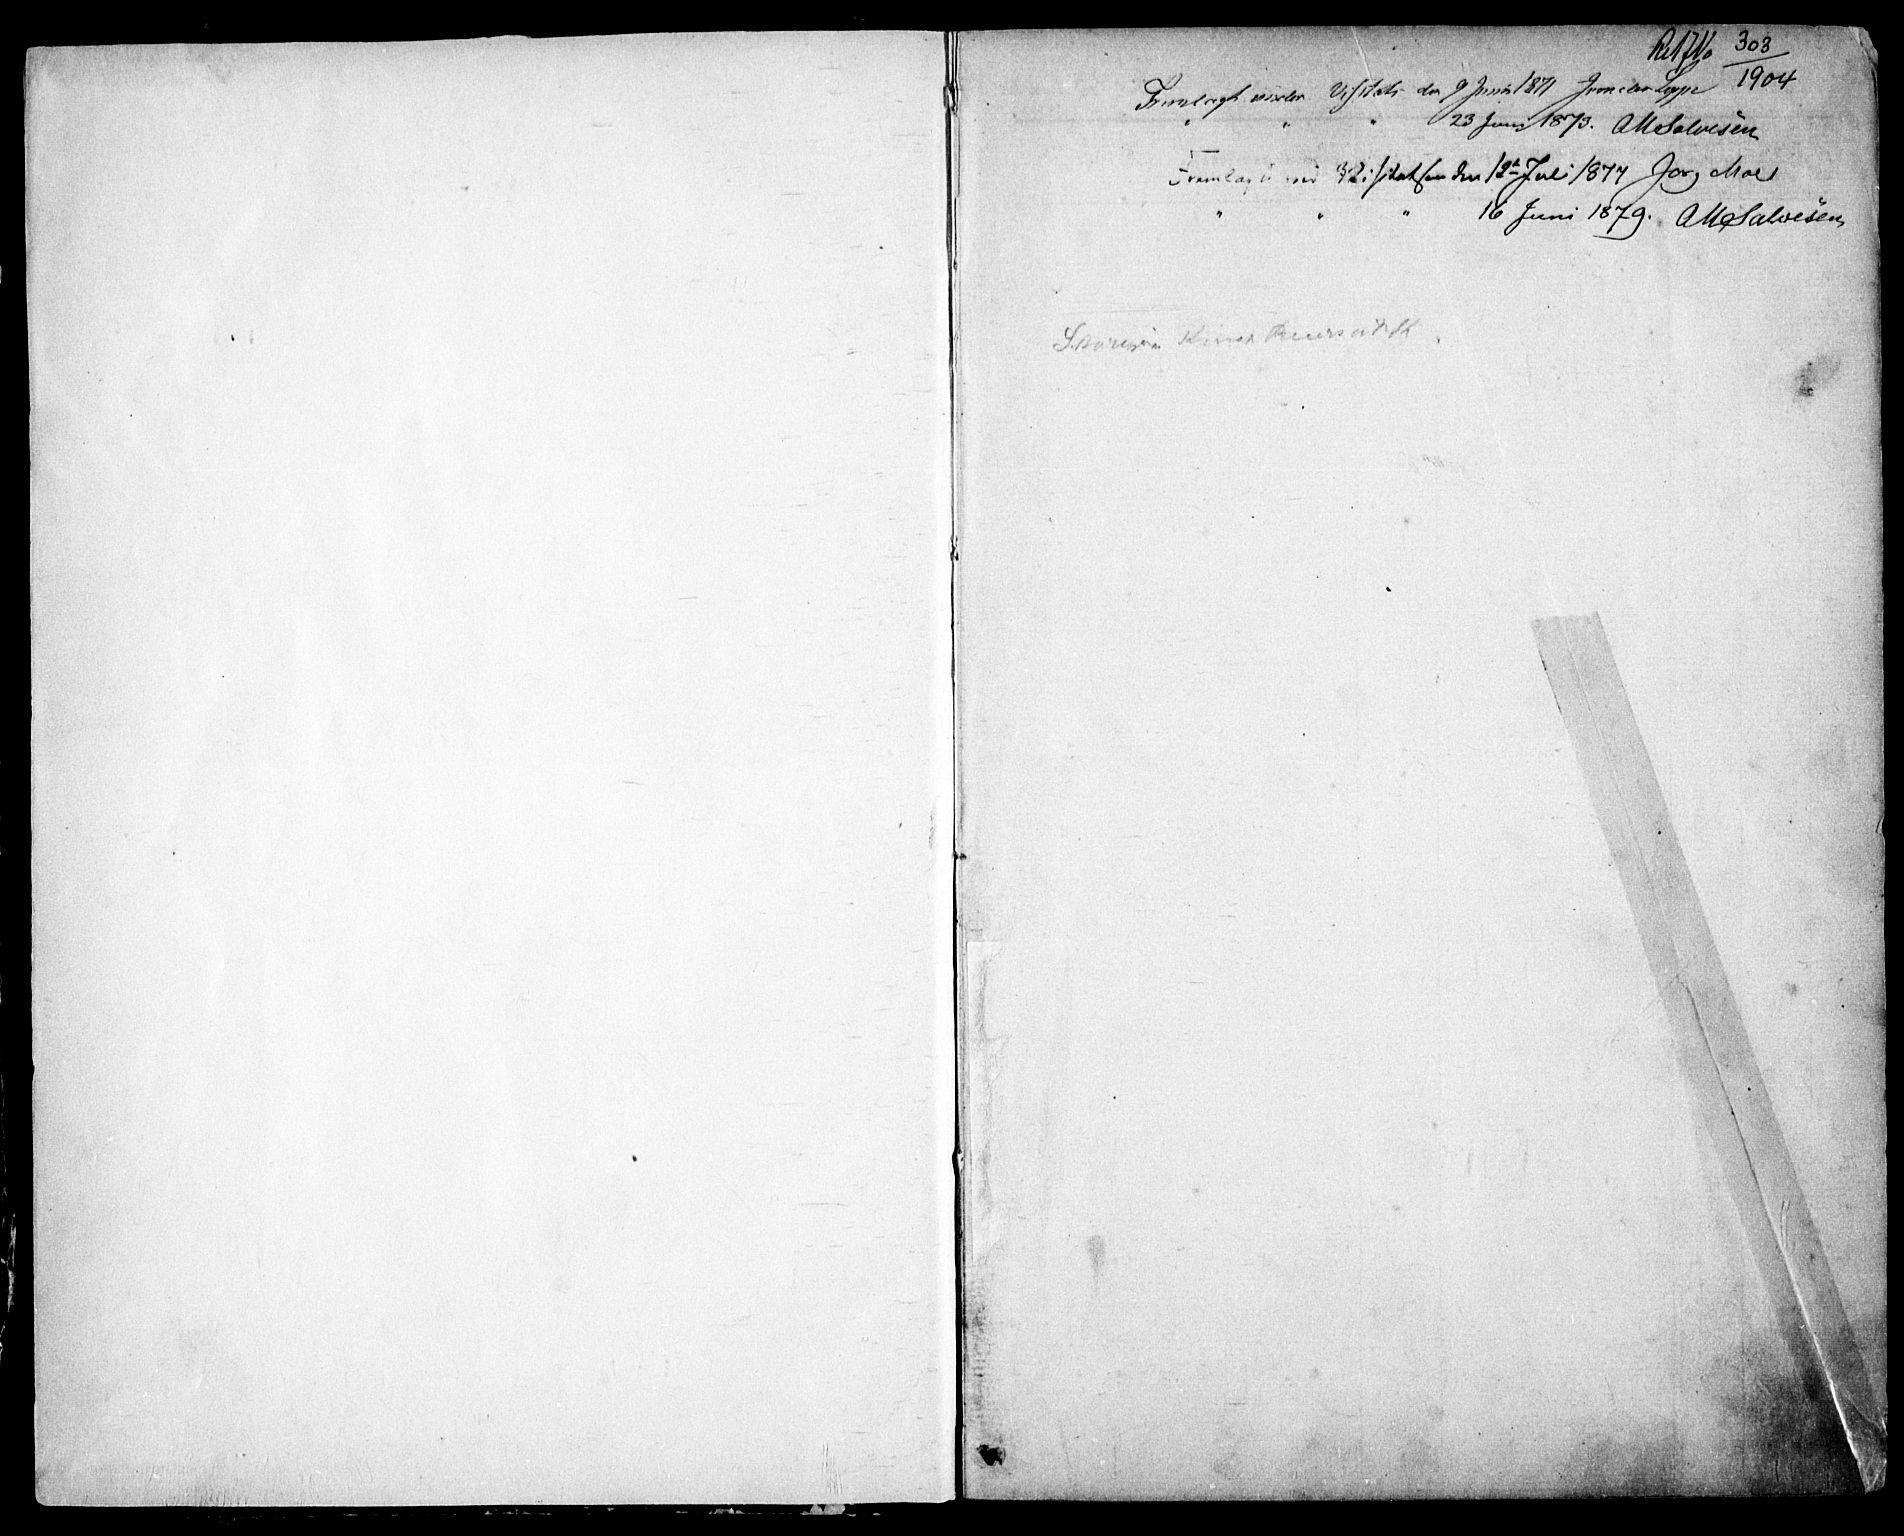 SAK, Fjære sokneprestkontor, F/Fb/L0010: Klokkerbok nr. B 10, 1871-1880